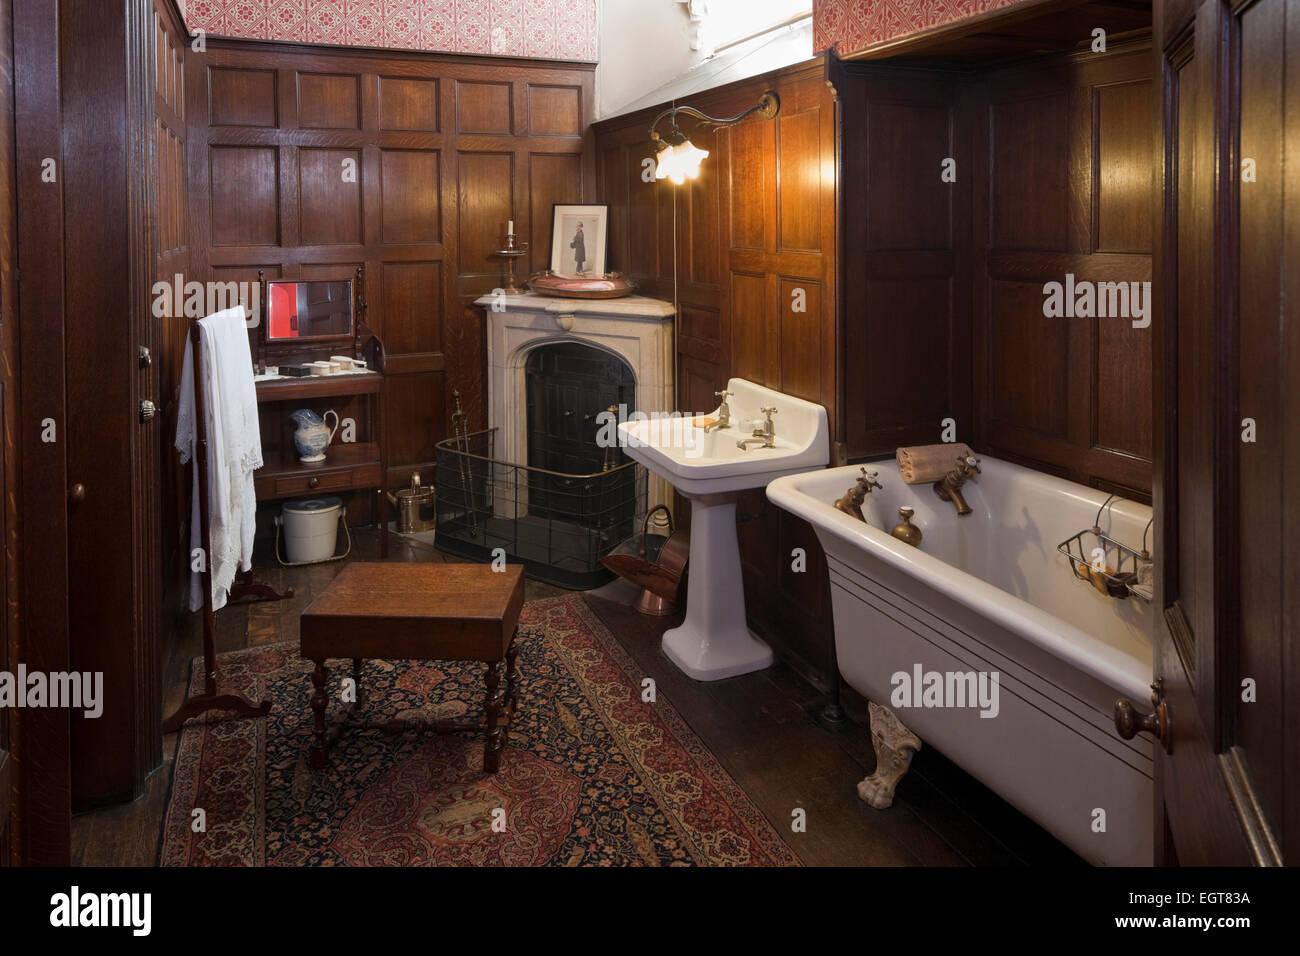 Victorian Bathroom In Newstead Abbey, Nottinghamshire, England, UK